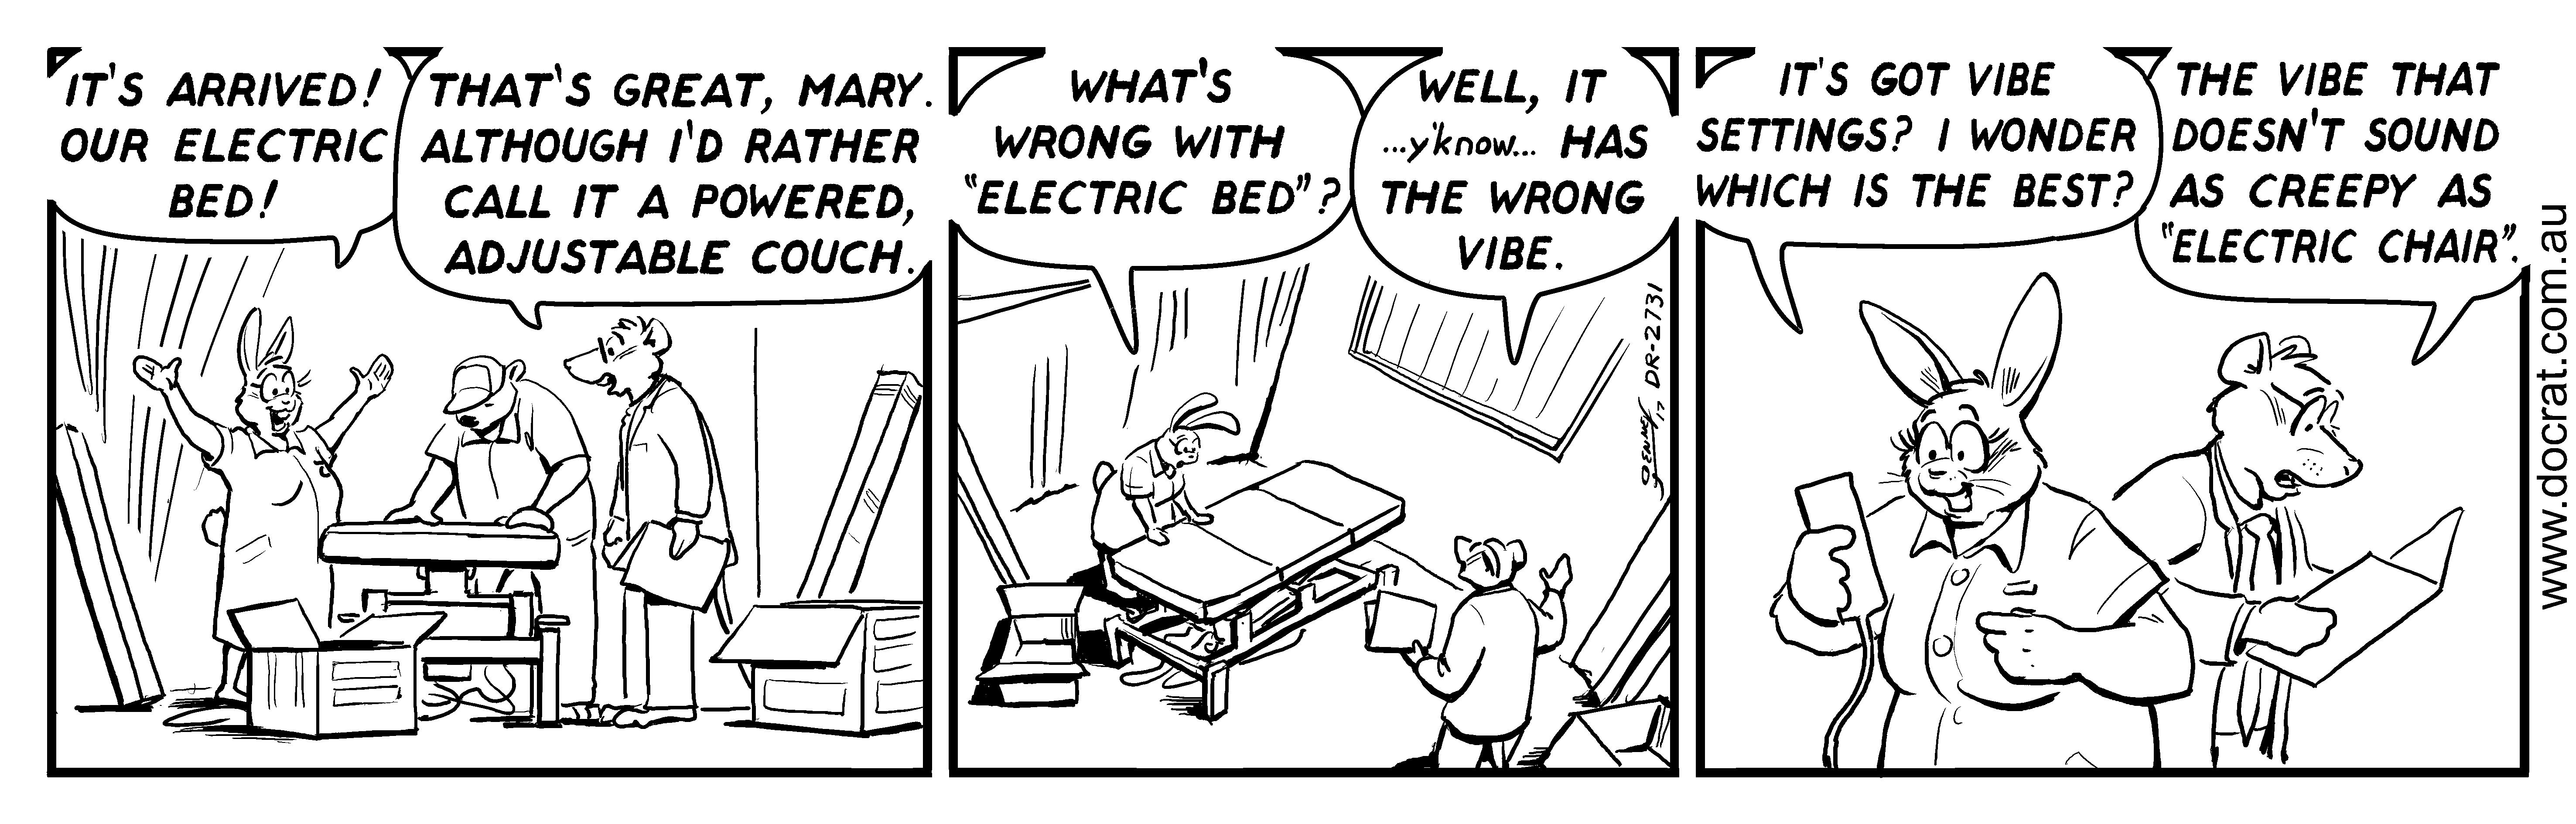 20170313